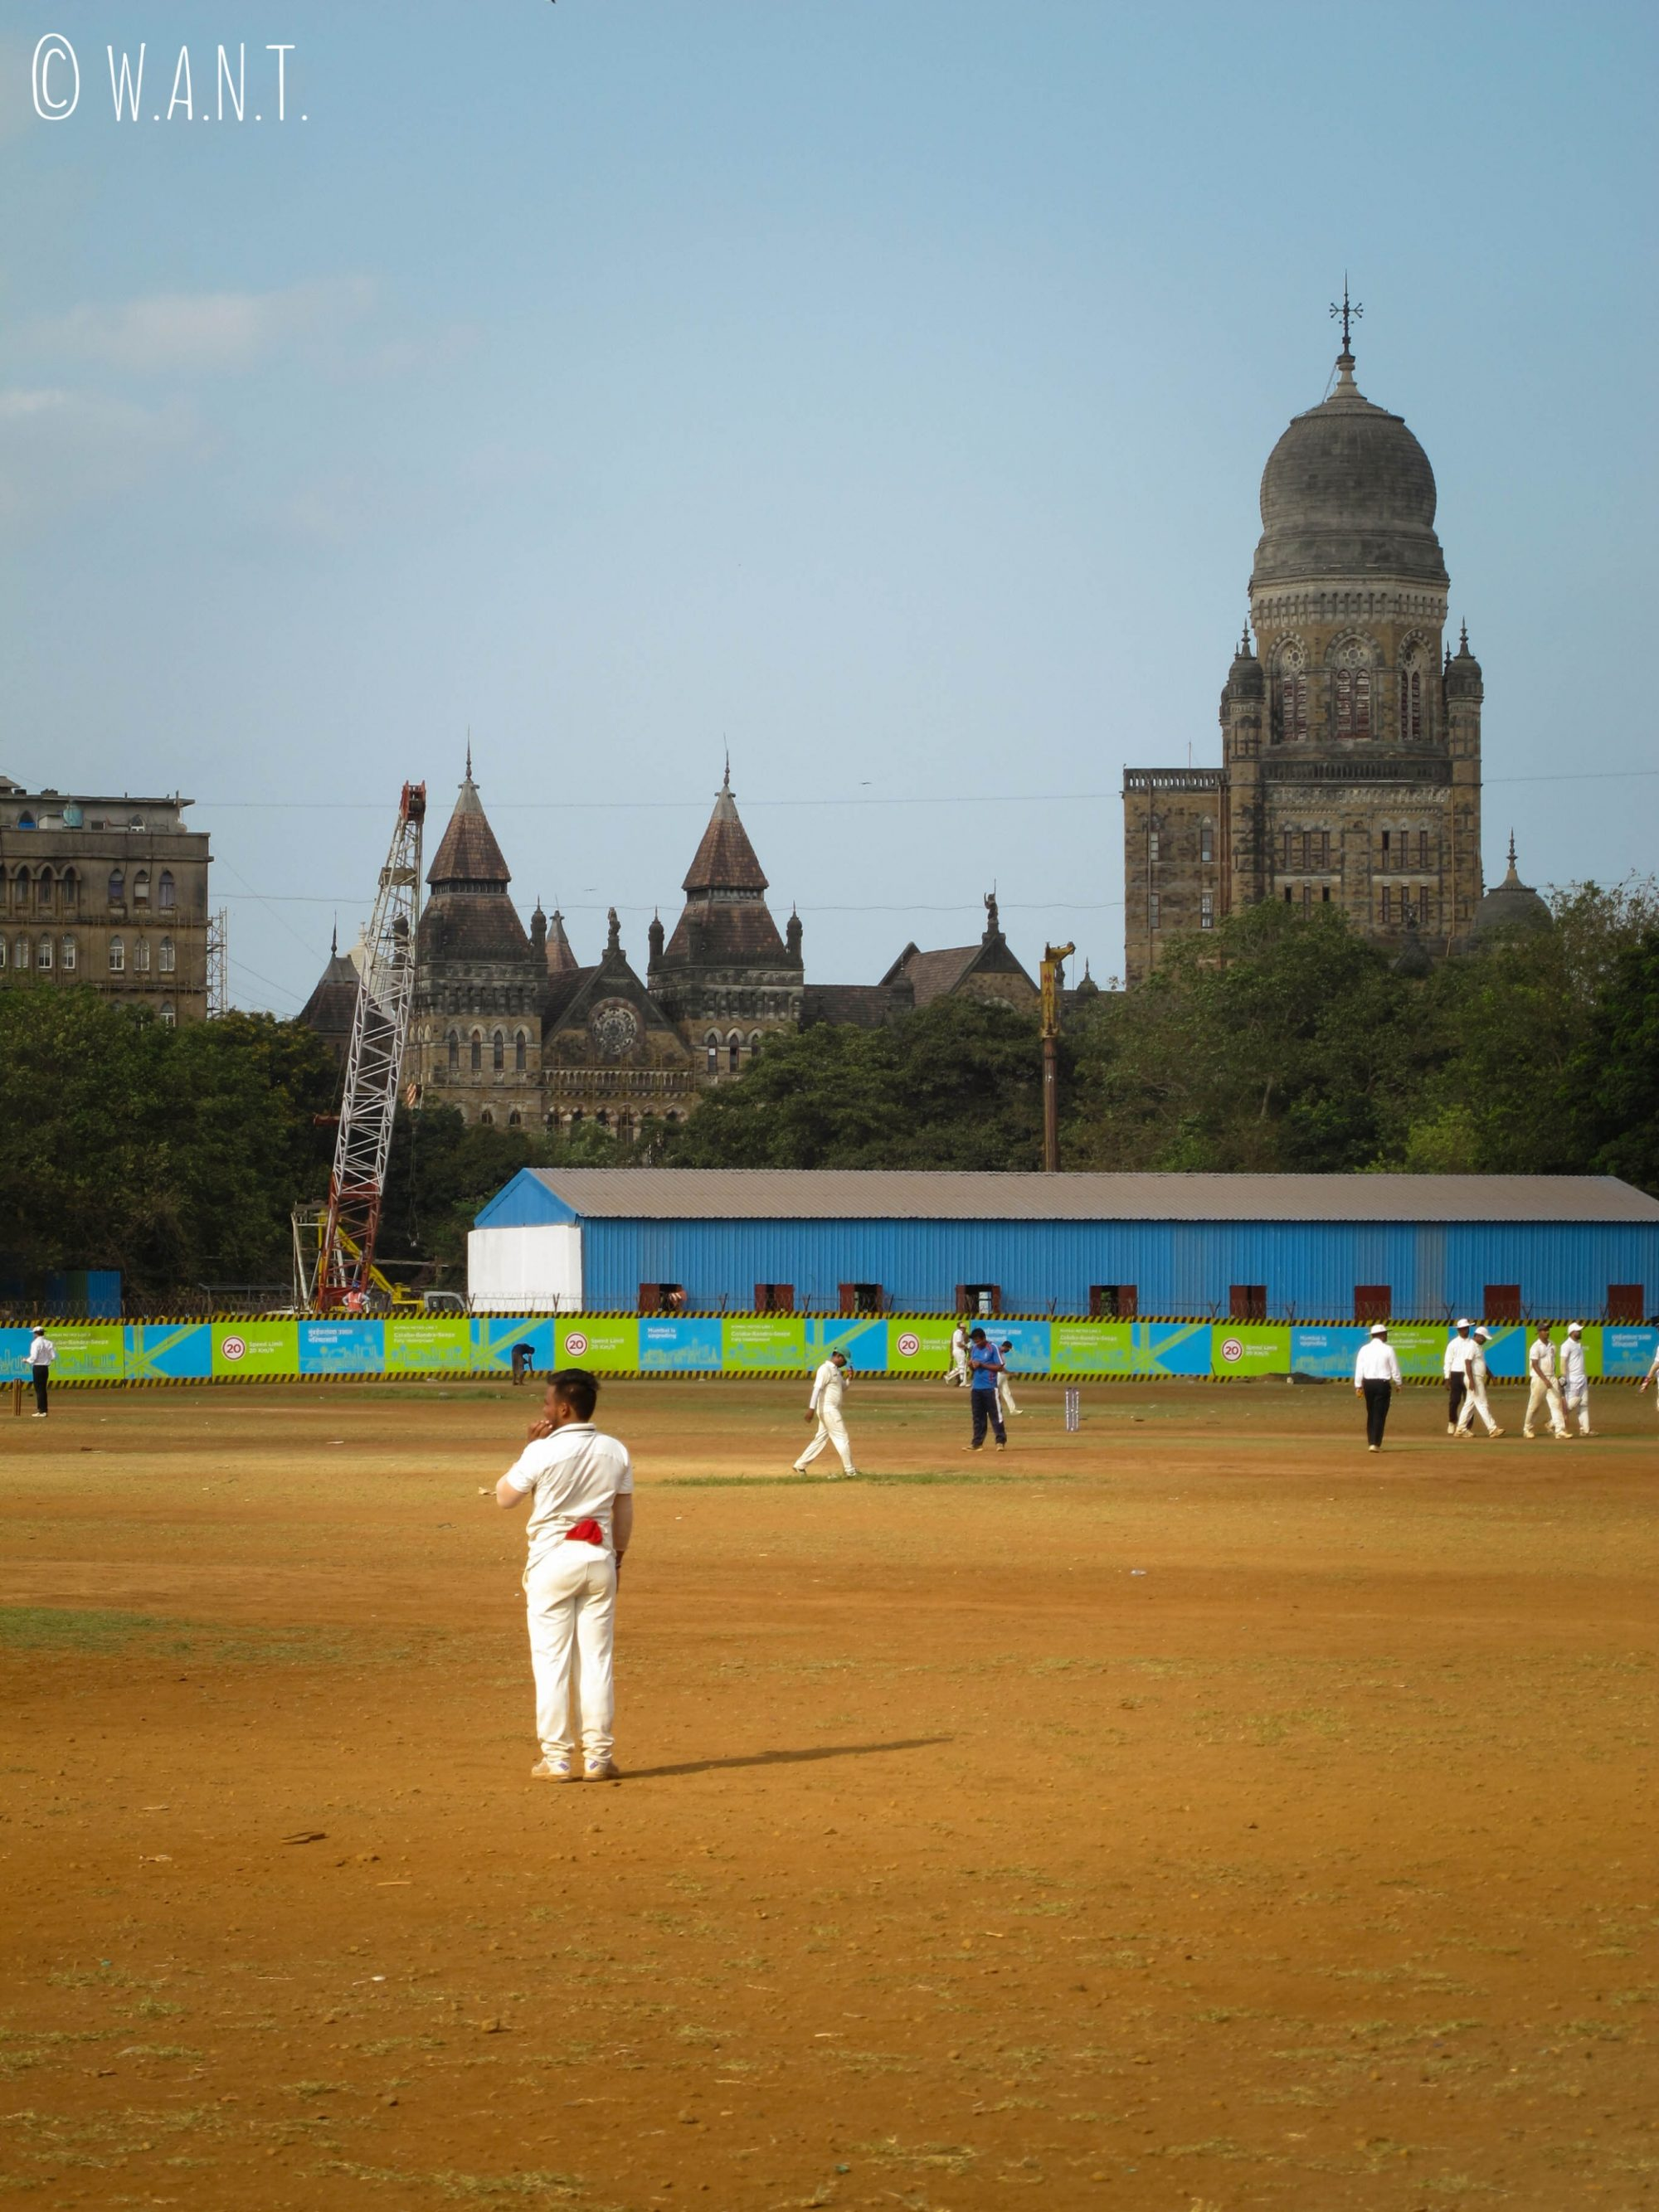 Terrain de cricket Oval Maidan